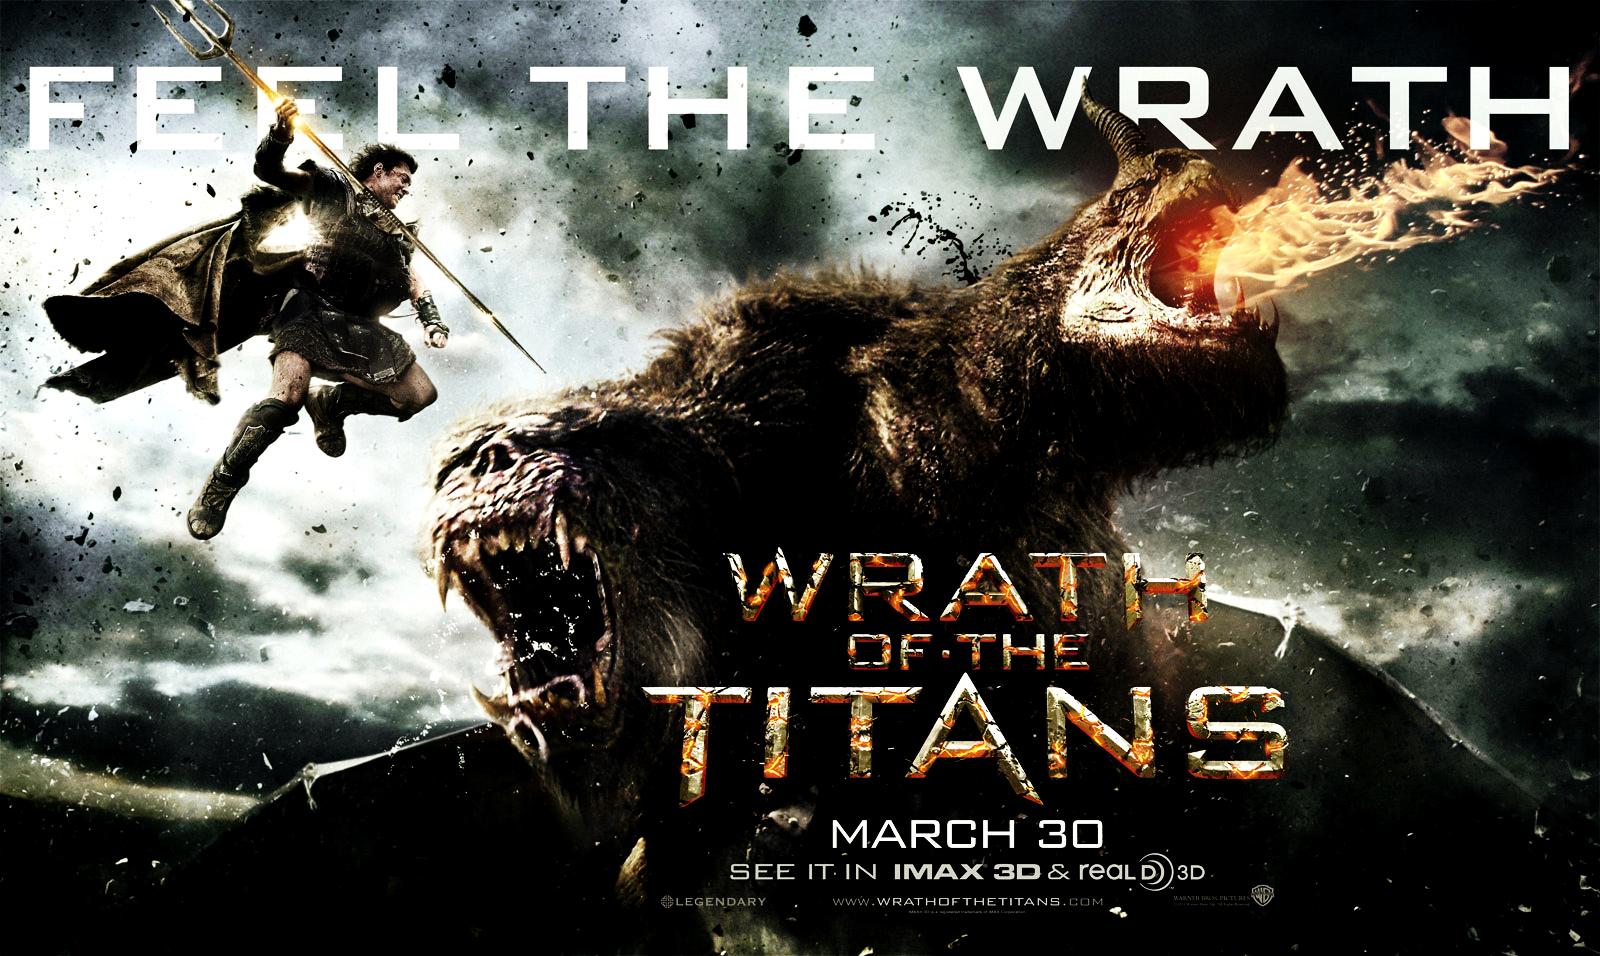 http://2.bp.blogspot.com/-gEAvZZtmt_0/T6l_ivQK6KI/AAAAAAAAAWo/A28hILhrPDw/s1600/Wrath_of_The_Titans_Chimera_Feel_The_Wrath_HD_Wallpaper-Vvallpaper.Net.jpg